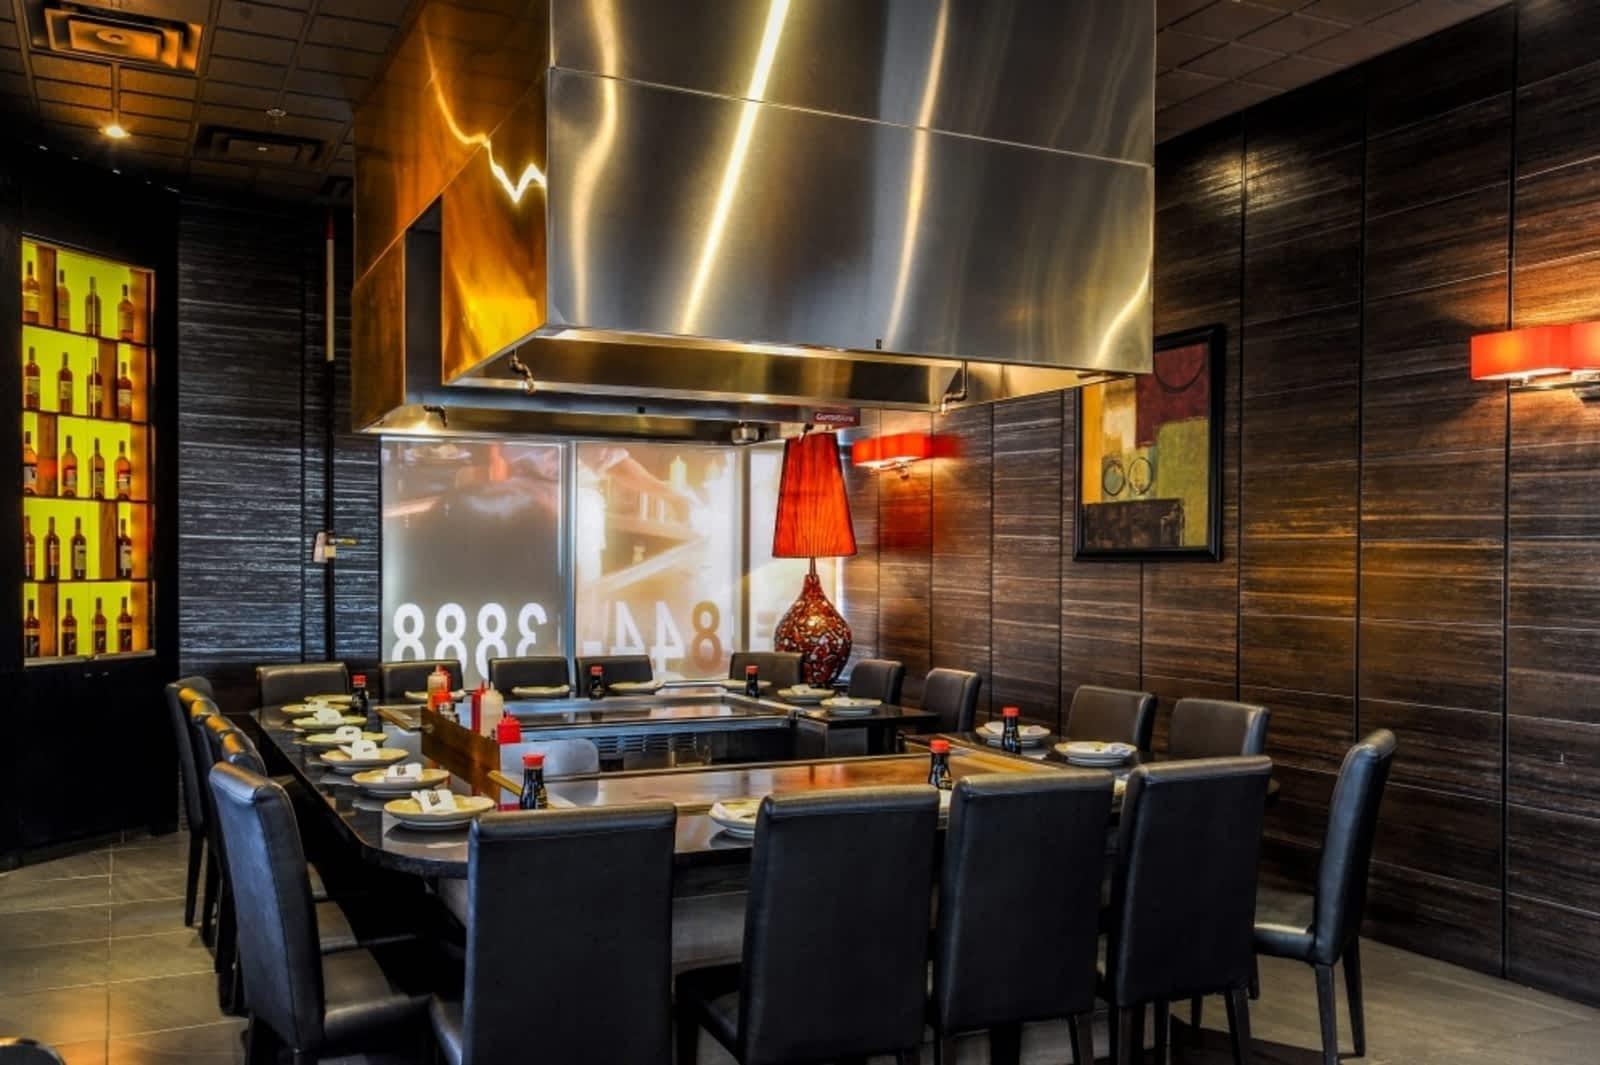 Hibachi Teppanyaki Bar Oakville Menu Hours Reservation - Hibachi table restaurant